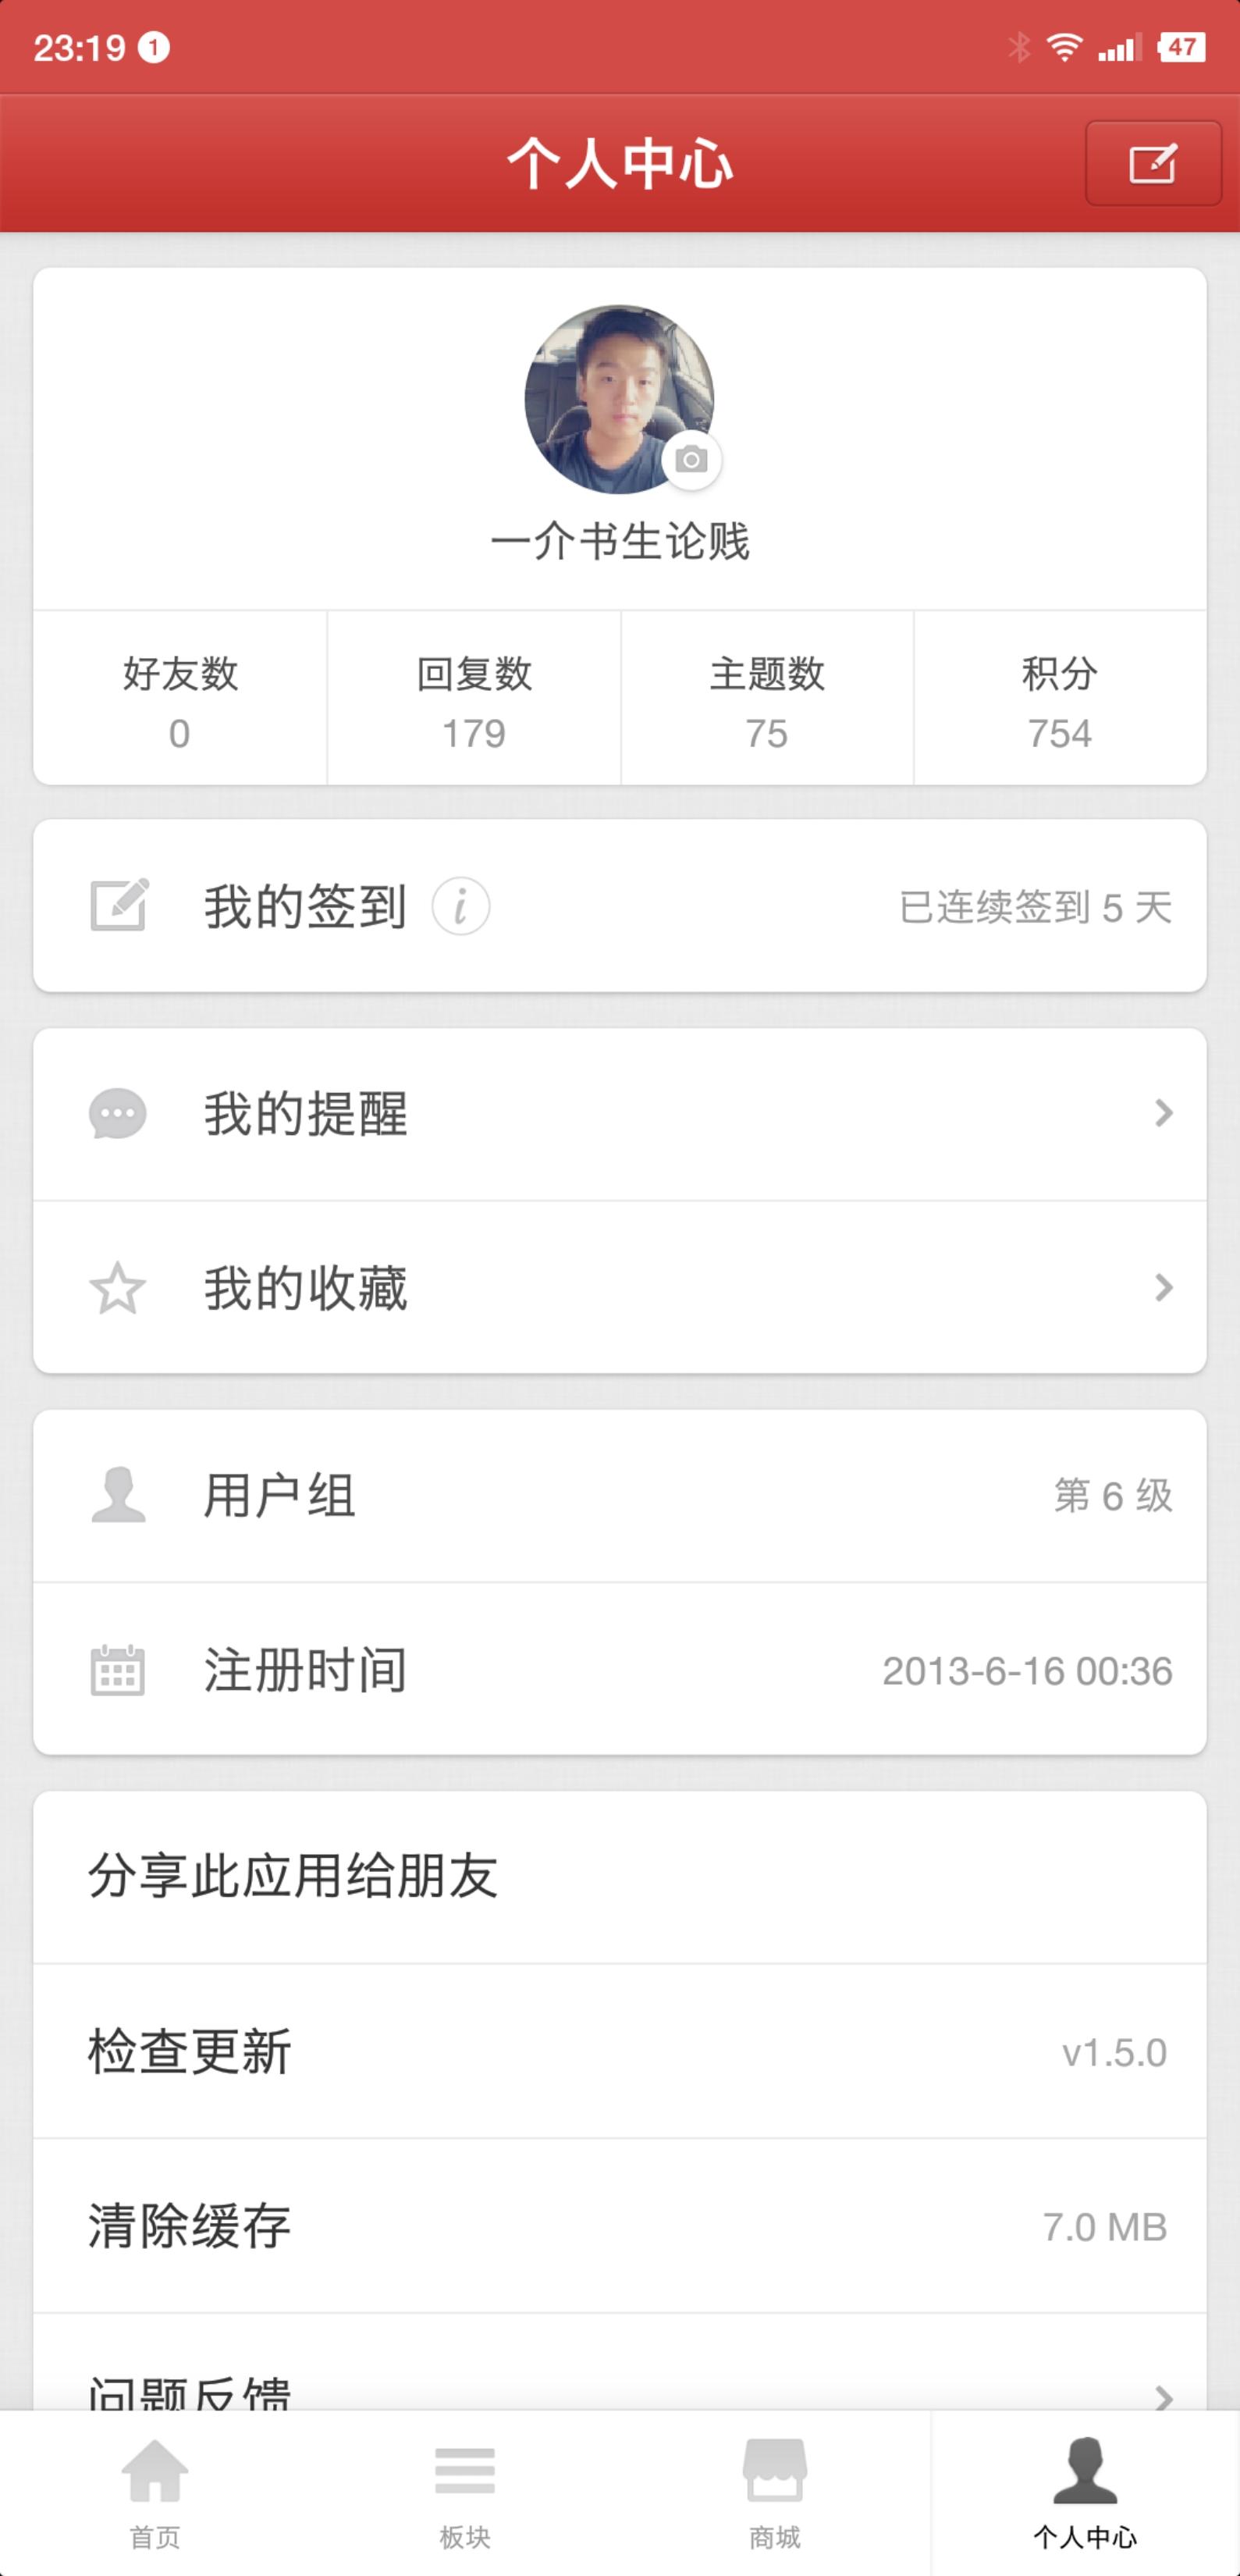 Screenshot_2018-07-09-23-19-27-671_??????.png